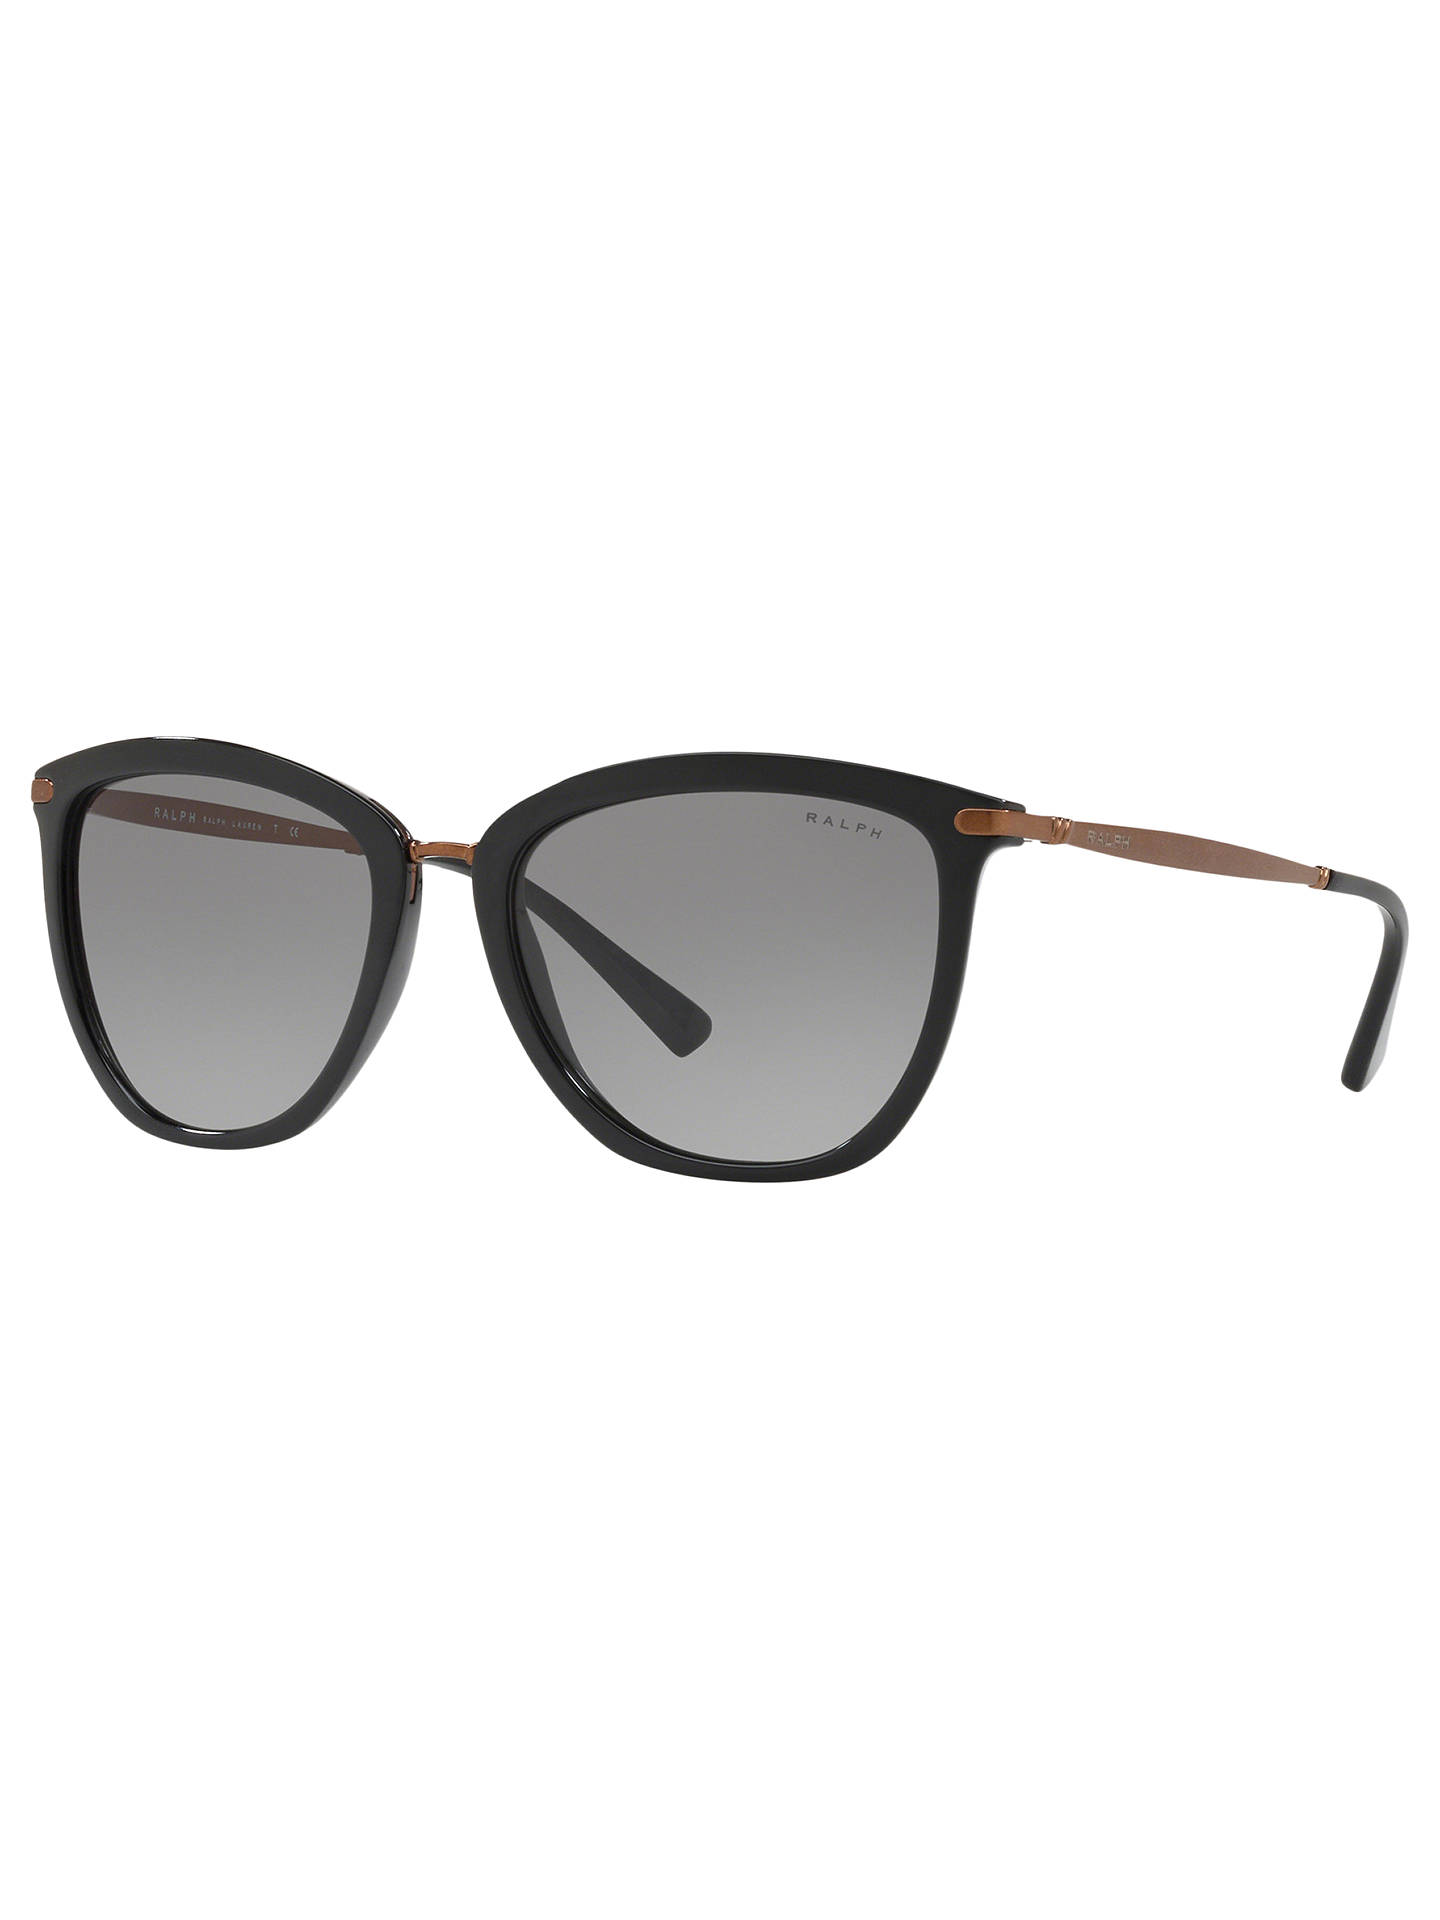 6e088fa53d BuyRalph RA5245 Women s Cat s Eye Sunglasses